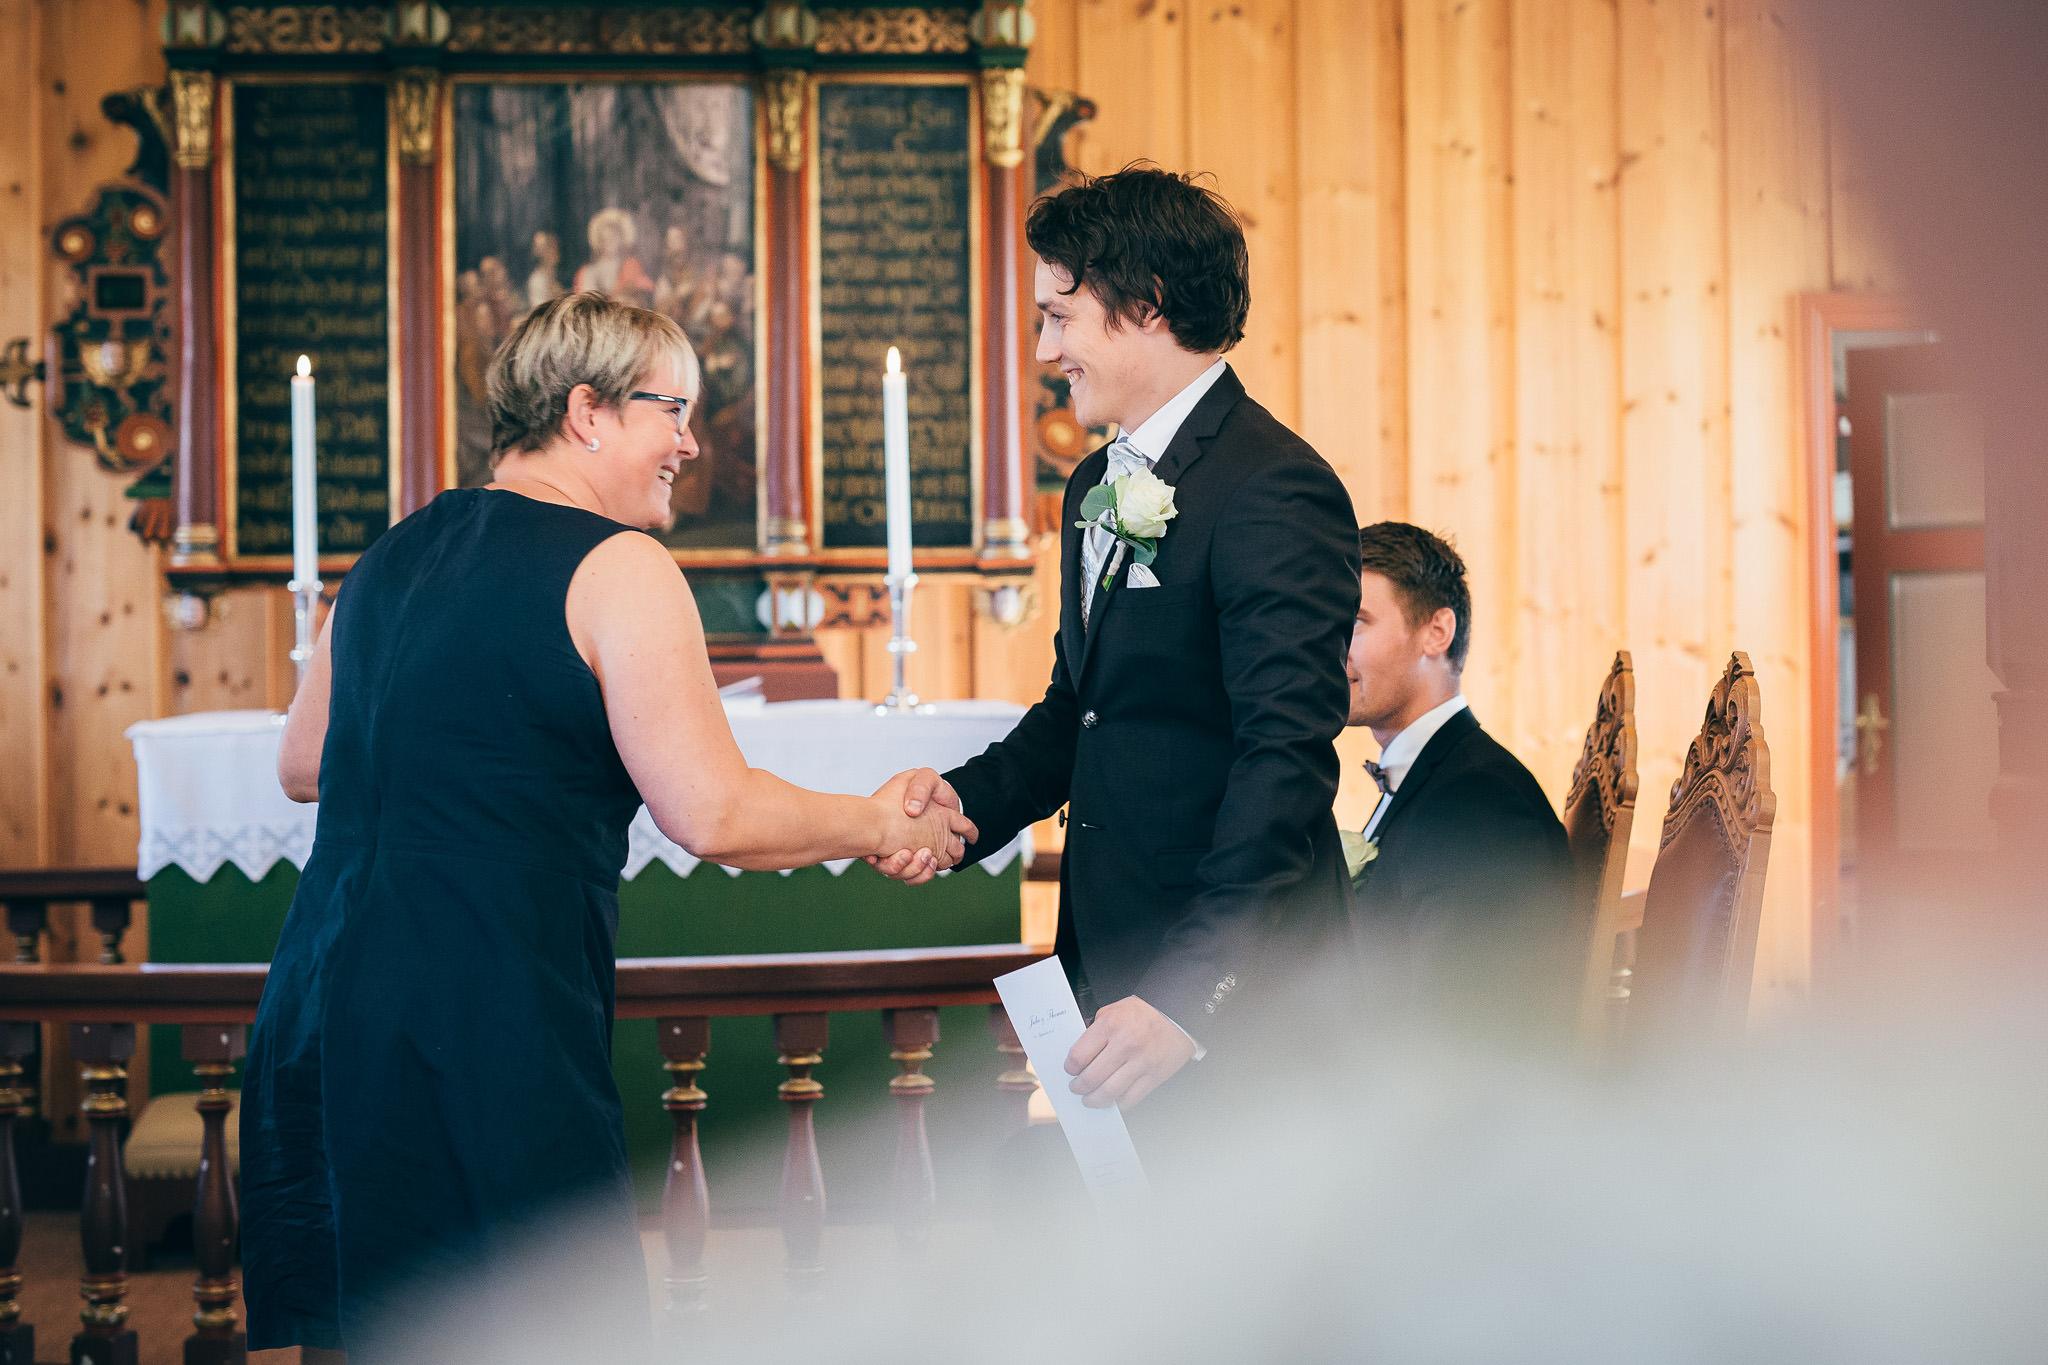 Wedding+Photographer+Norway+Bryllupsfotograf+Casey+Arneson+JT-29.jpg